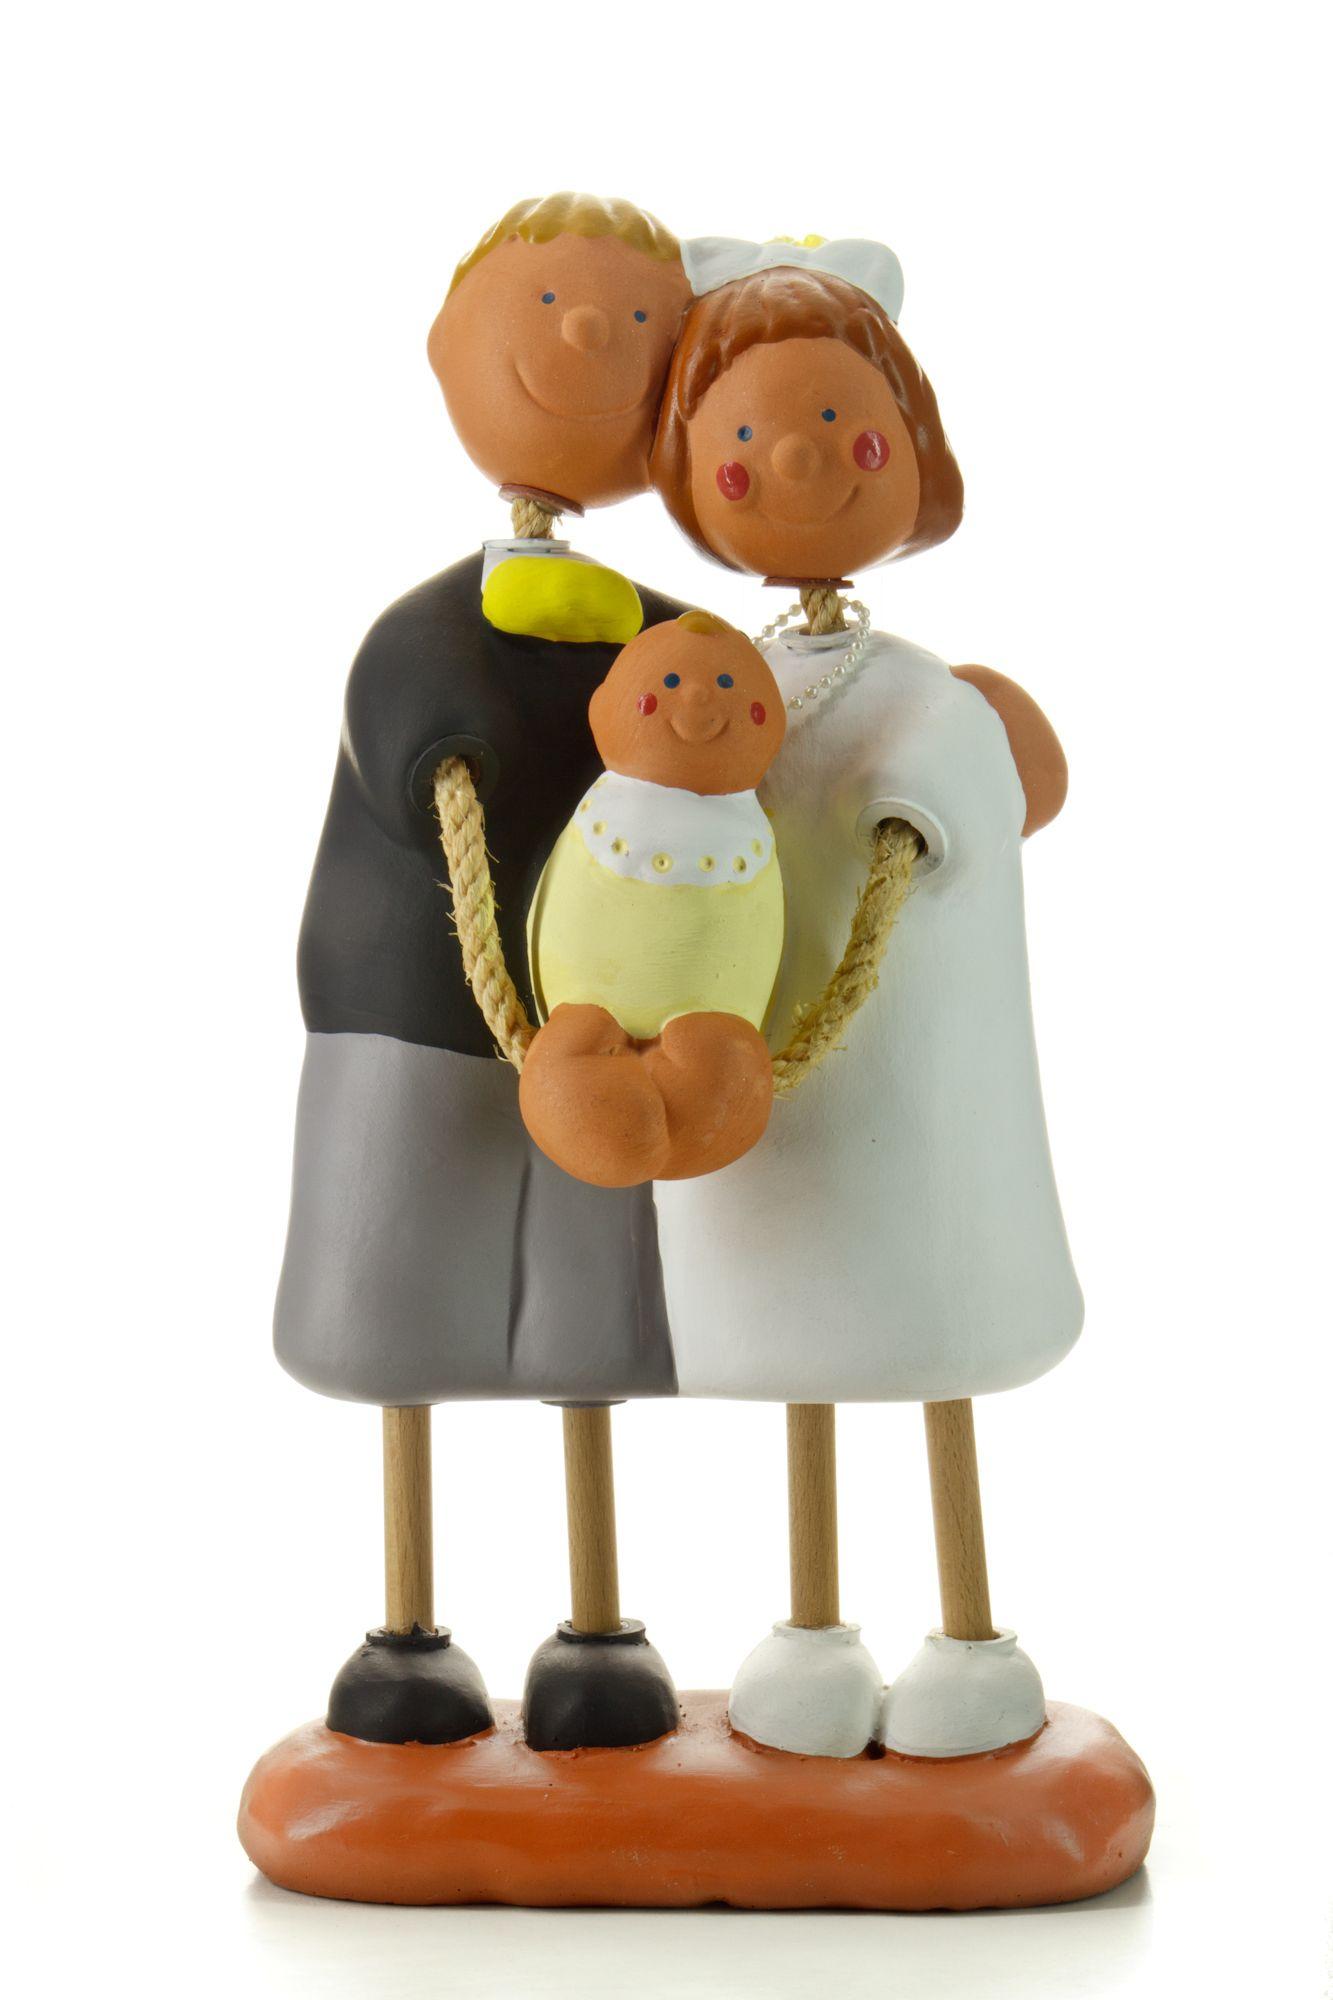 Familia de #Boda #Wedding #BridalCouple http://www.troyajullar.com/media/catalog/product/cache/1/image/500x500/9df78eab33525d08d6e5fb8d27136e95/j/c/jc403119.jpg